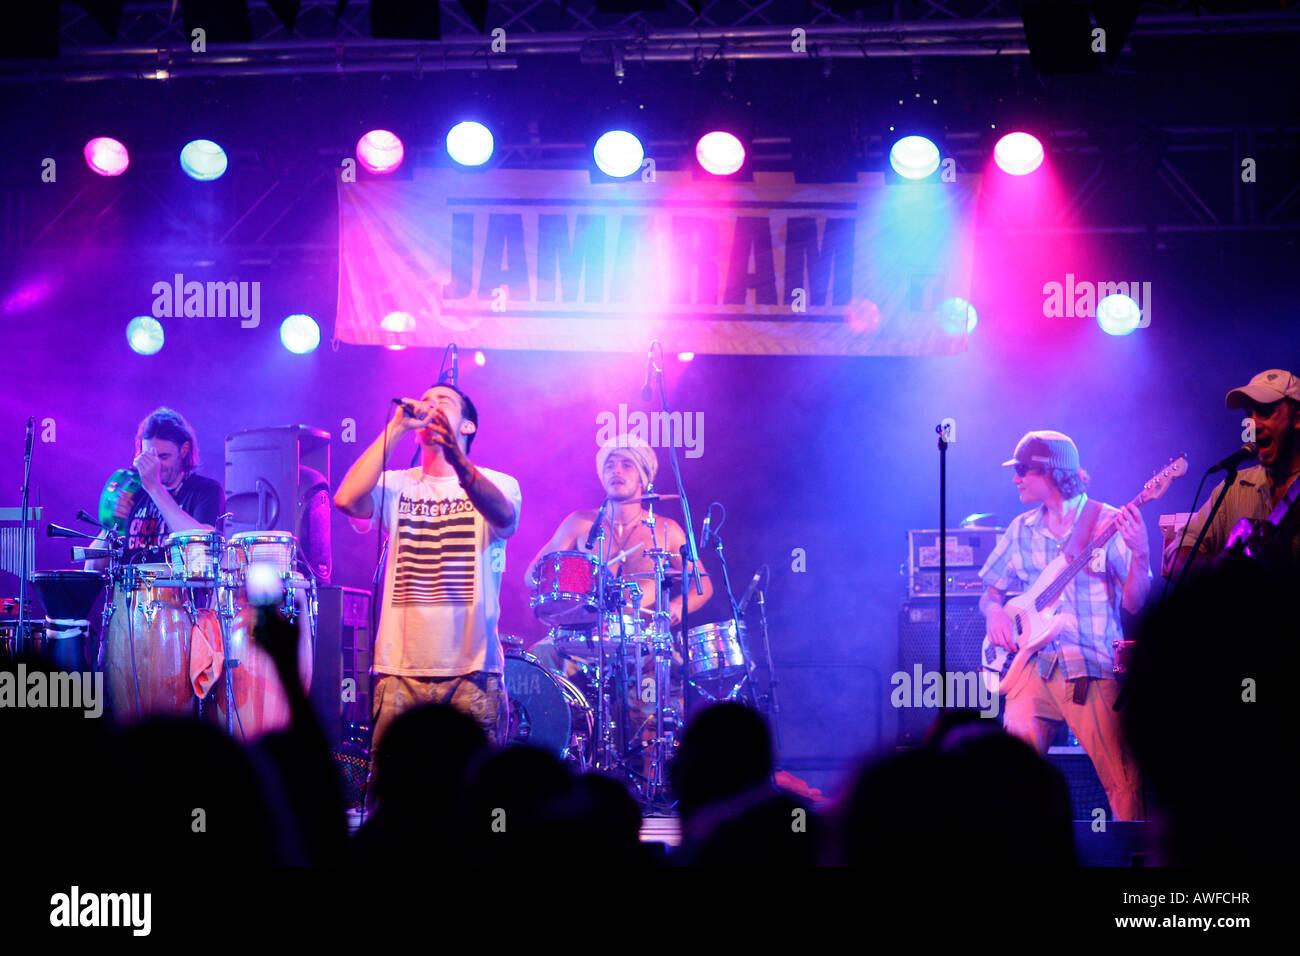 'JAMARAM' reggae band, reggae concert in Muehldorf am Inn, Upper Bavaria, Bavaria, Germany, Europe - Stock Image